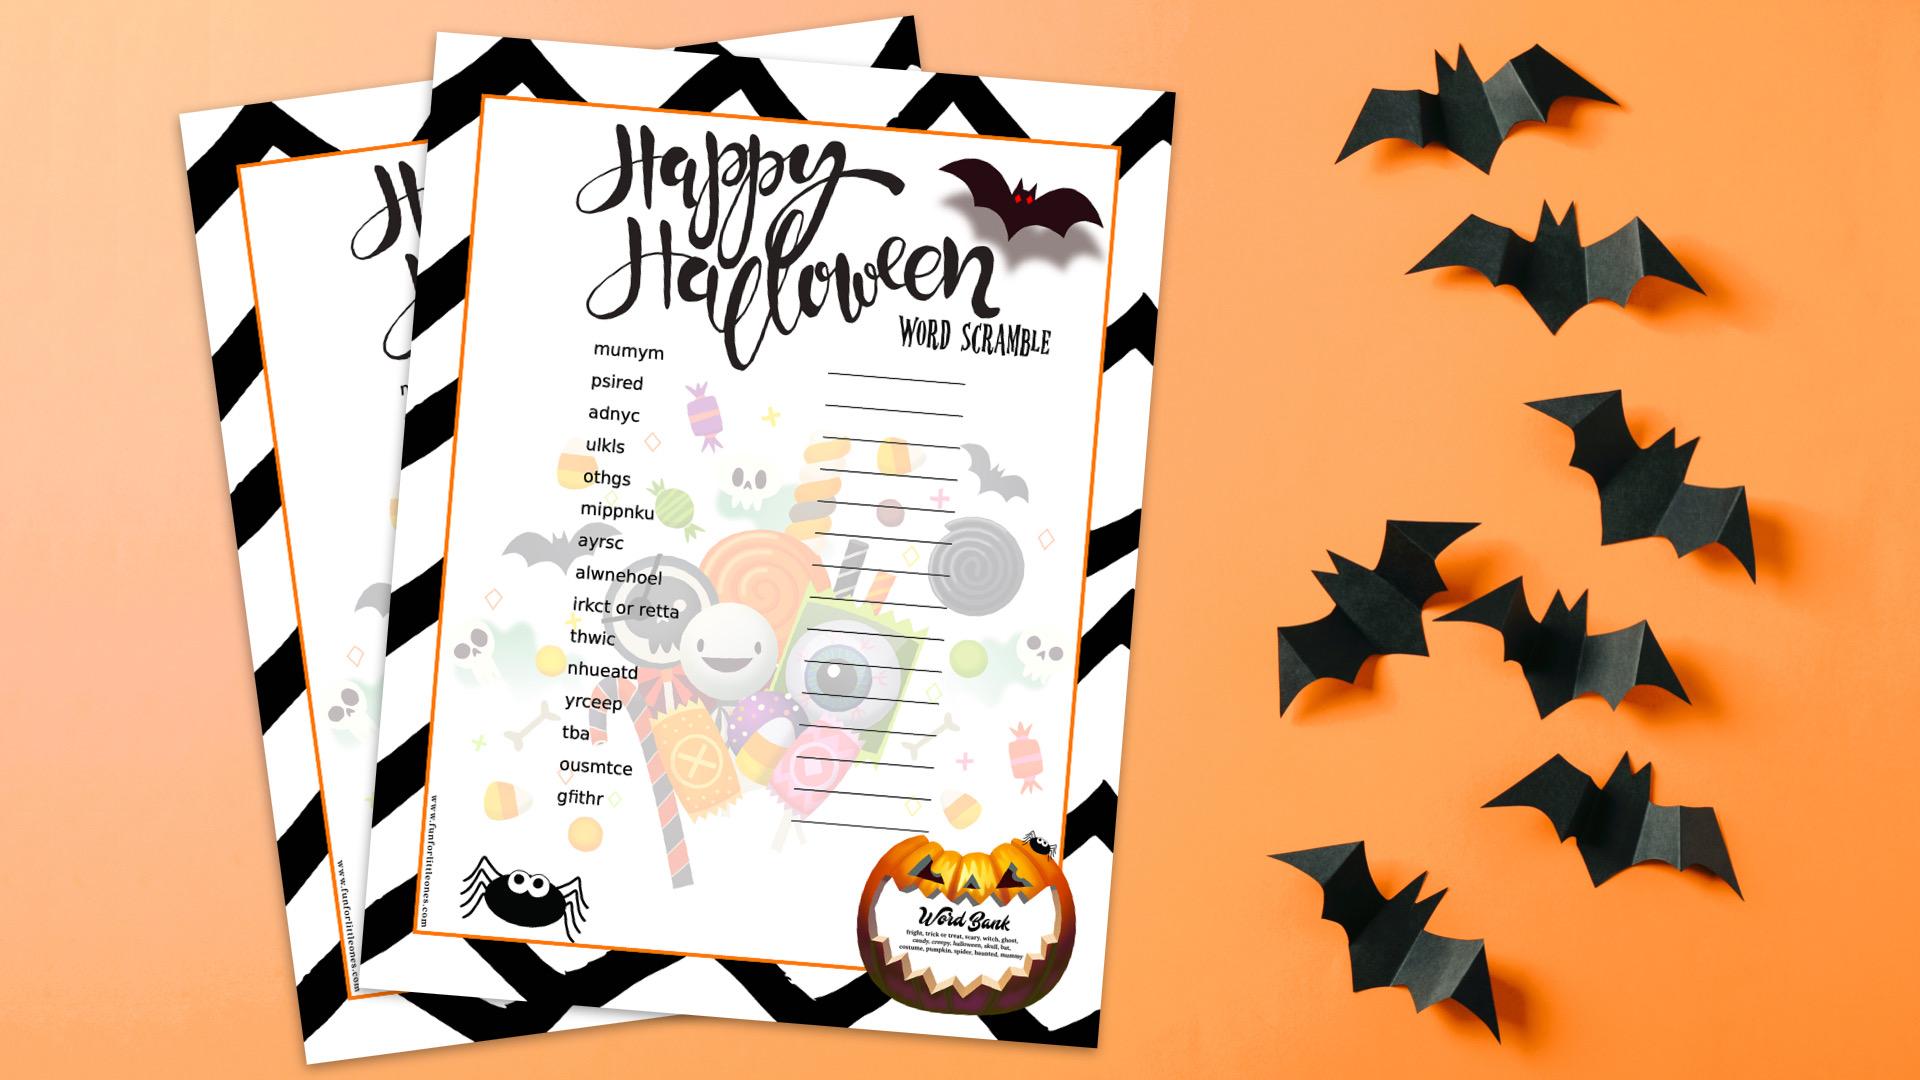 Free Printable Halloween Word Scramble for Kids + 17 More Freebies! 27